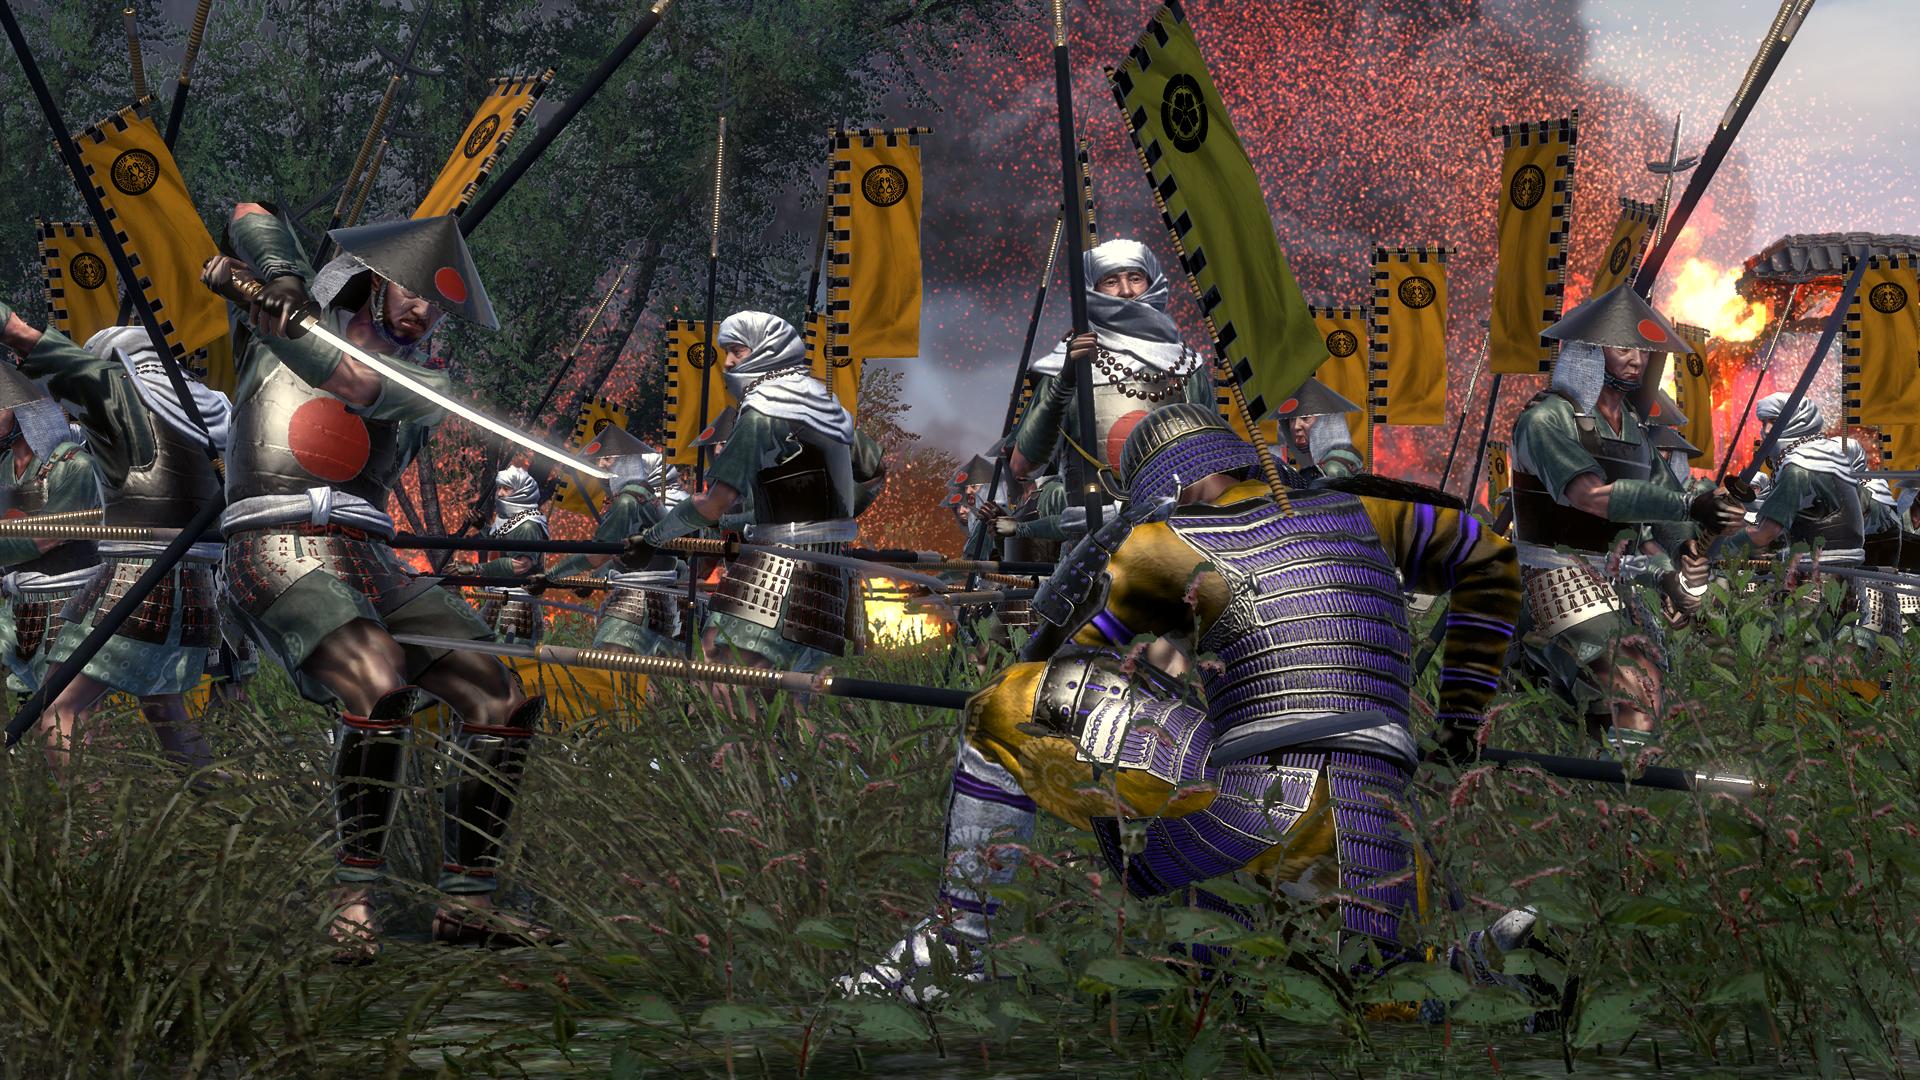 Shogun 2 Fall Of The Samurai Wallpaper Shogun 2 Ikko Ikki Clan Dlc Pack Released Gamingshogun